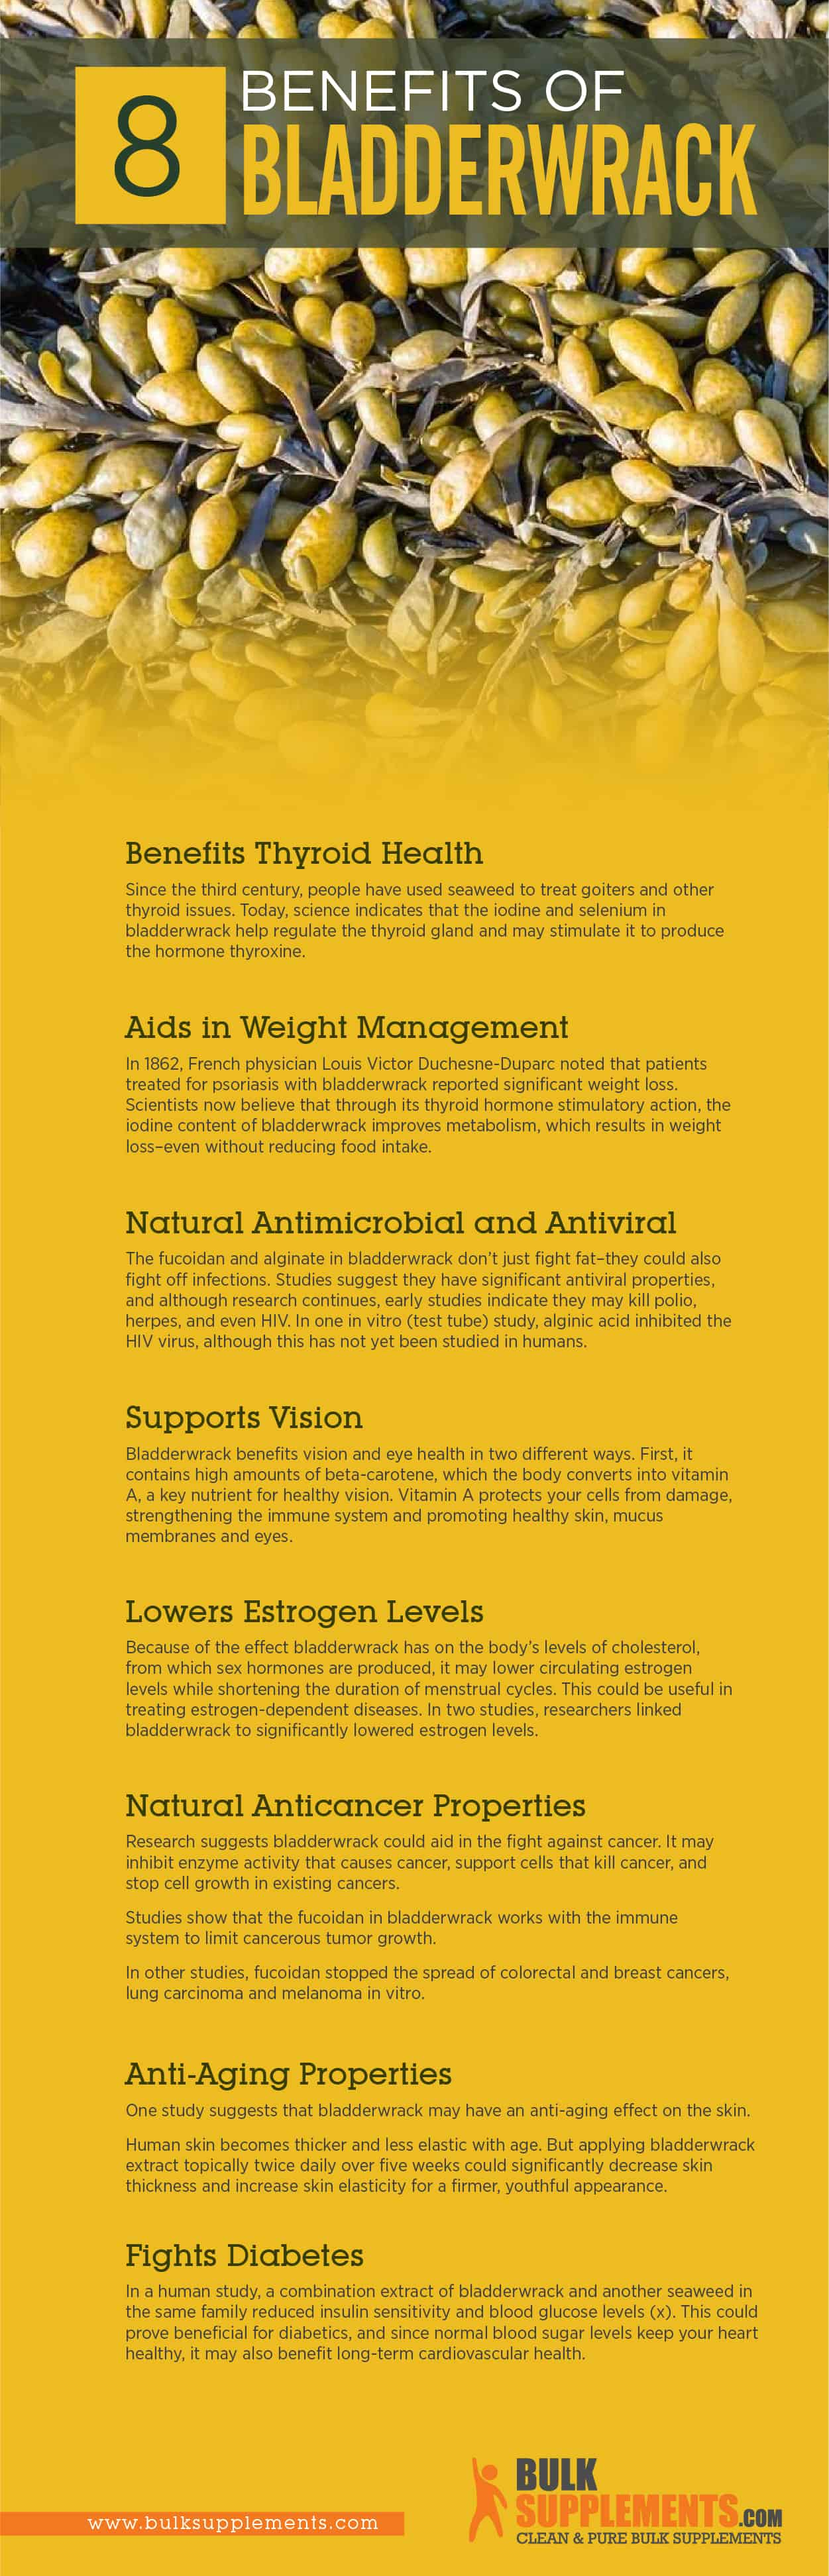 Bladderwrack Benefits, Side Effects and Dosage